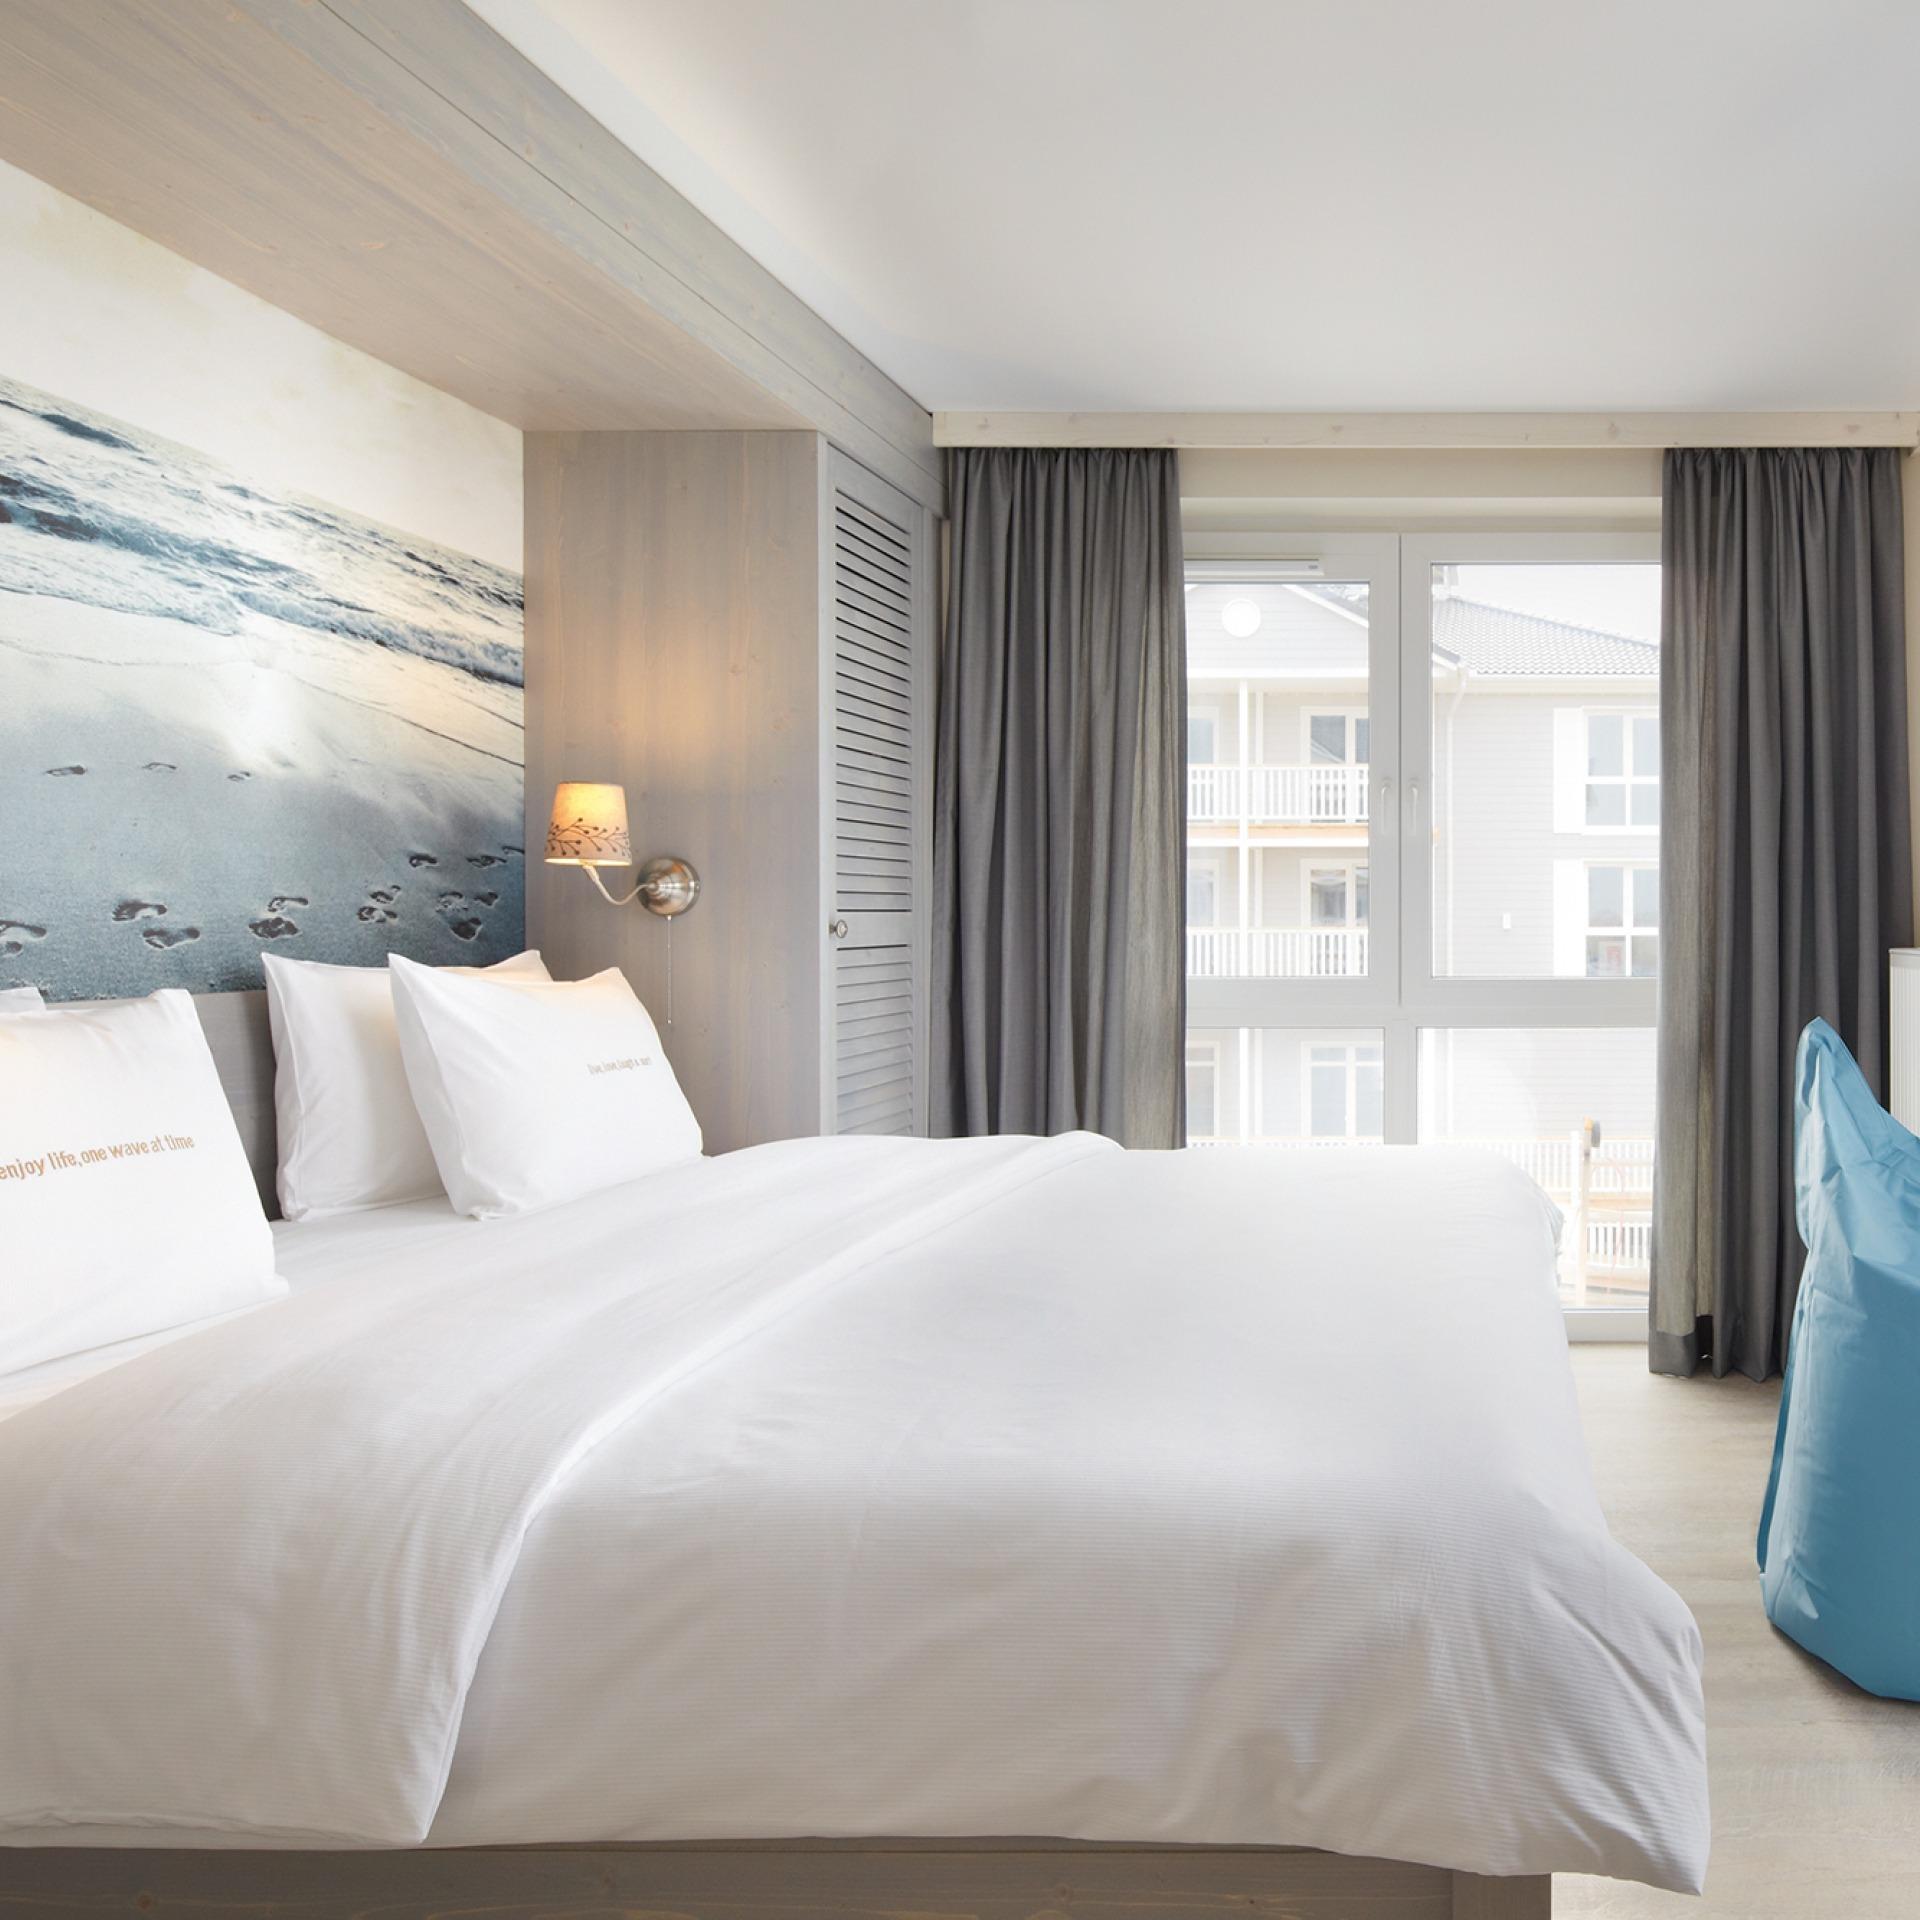 zimmer beach motel spo mit meerblick. Black Bedroom Furniture Sets. Home Design Ideas